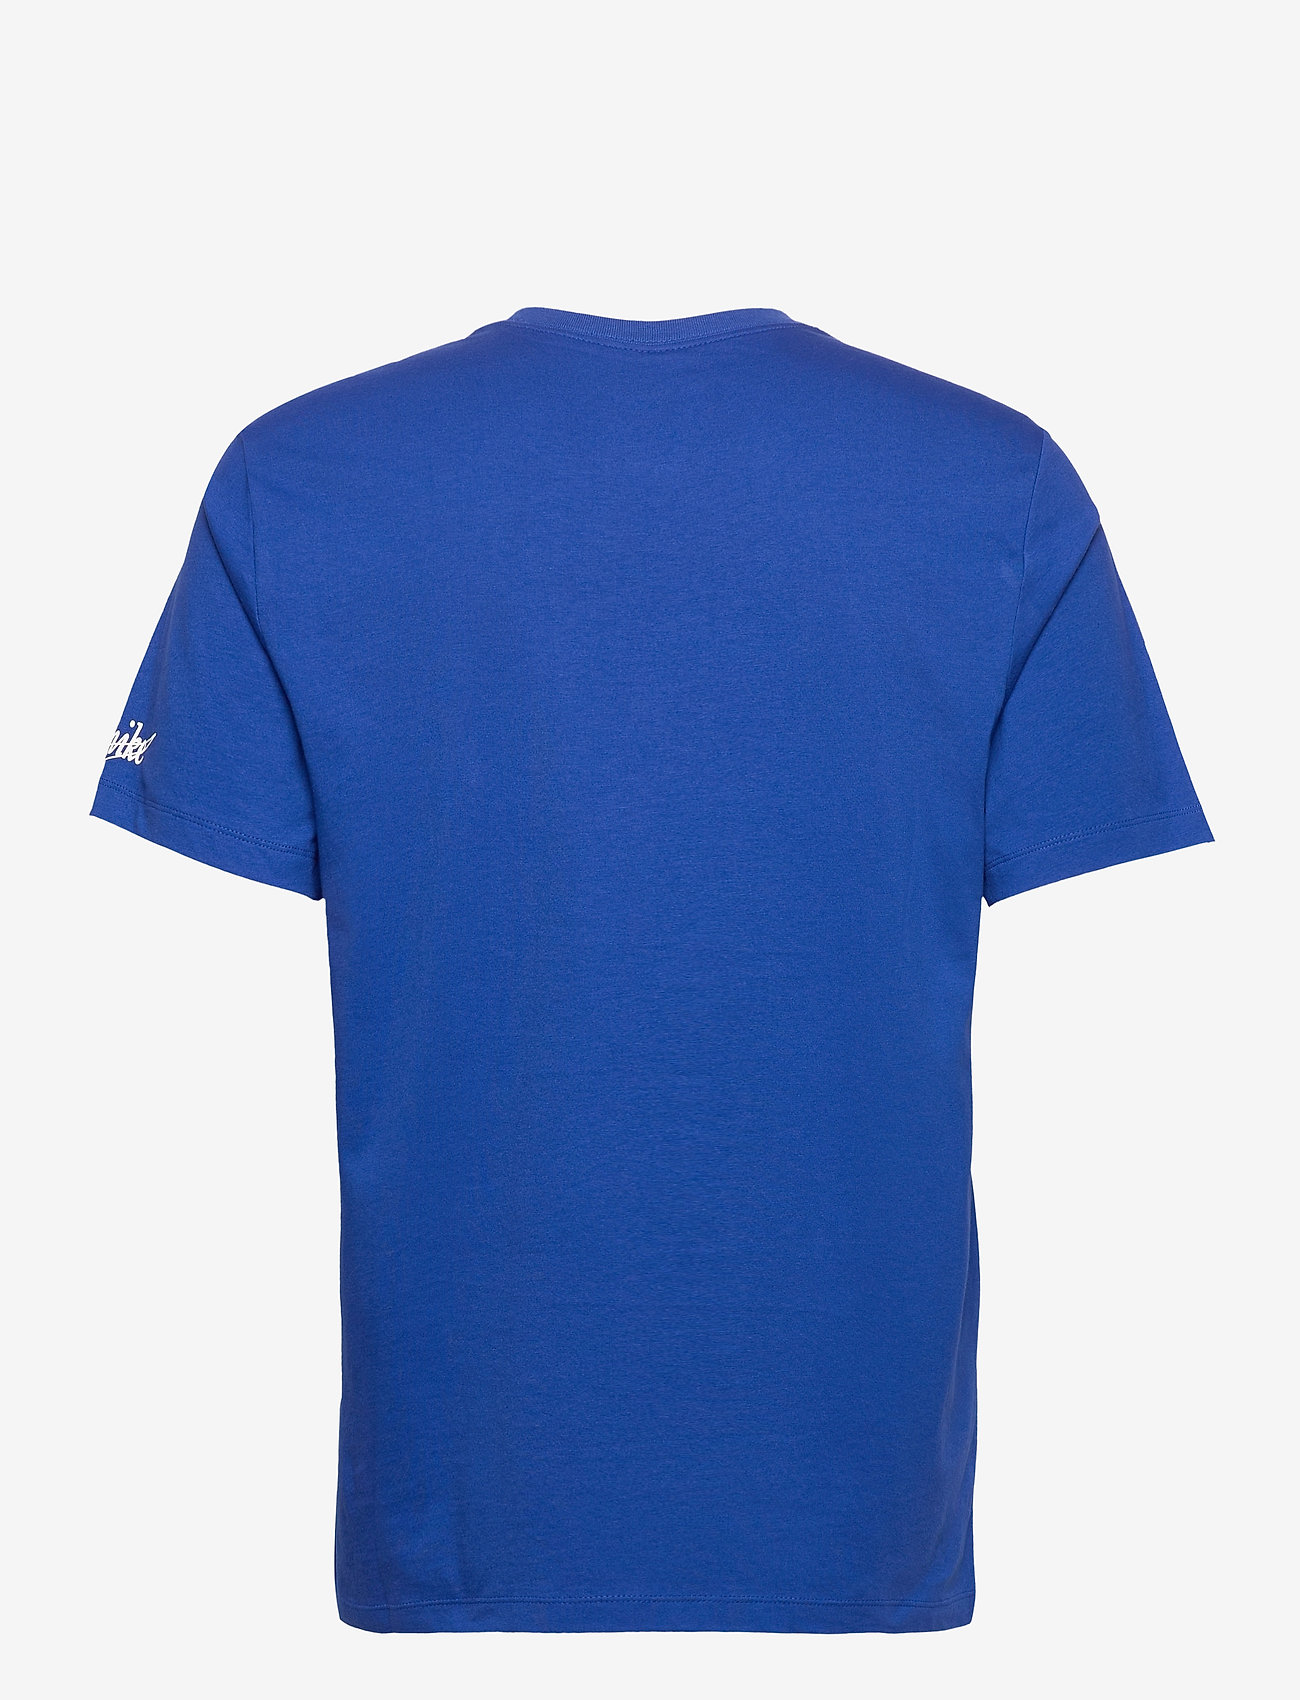 NIKE Fan Gear New England Patriots Nike Historic Tri-Blend T-Shirt - T-skjorter OLD ROYAL - Menn Klær